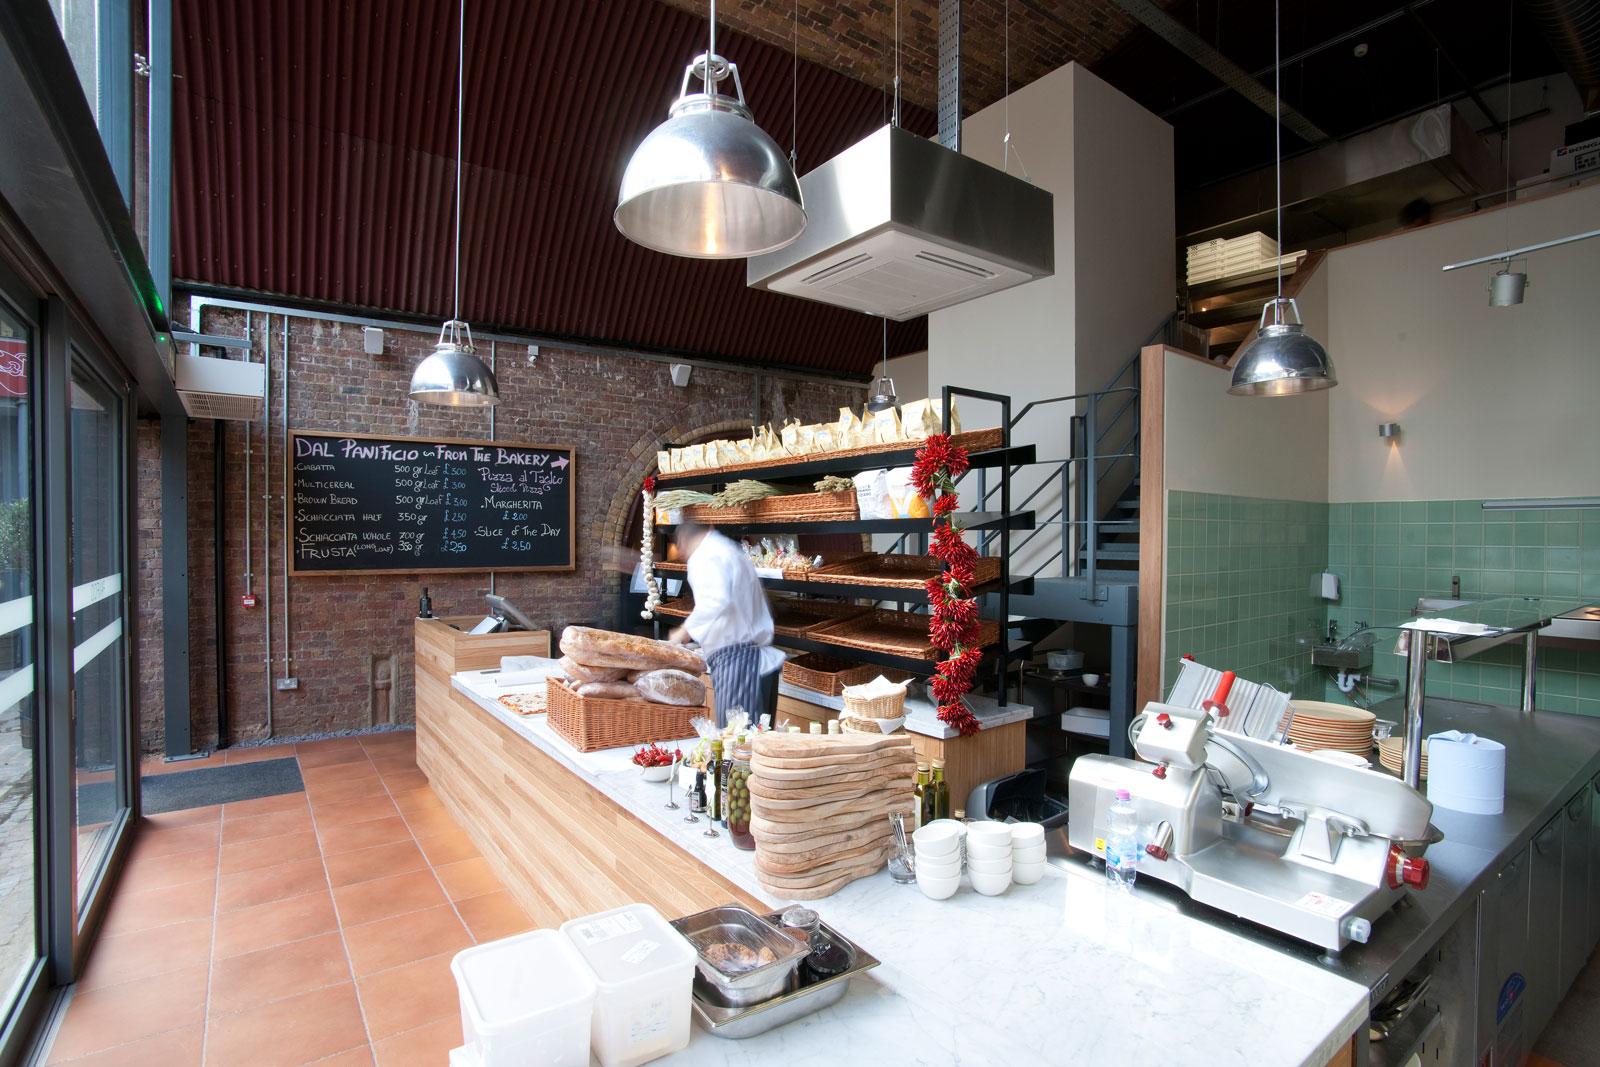 View of kitchen prep area in nice restaurant